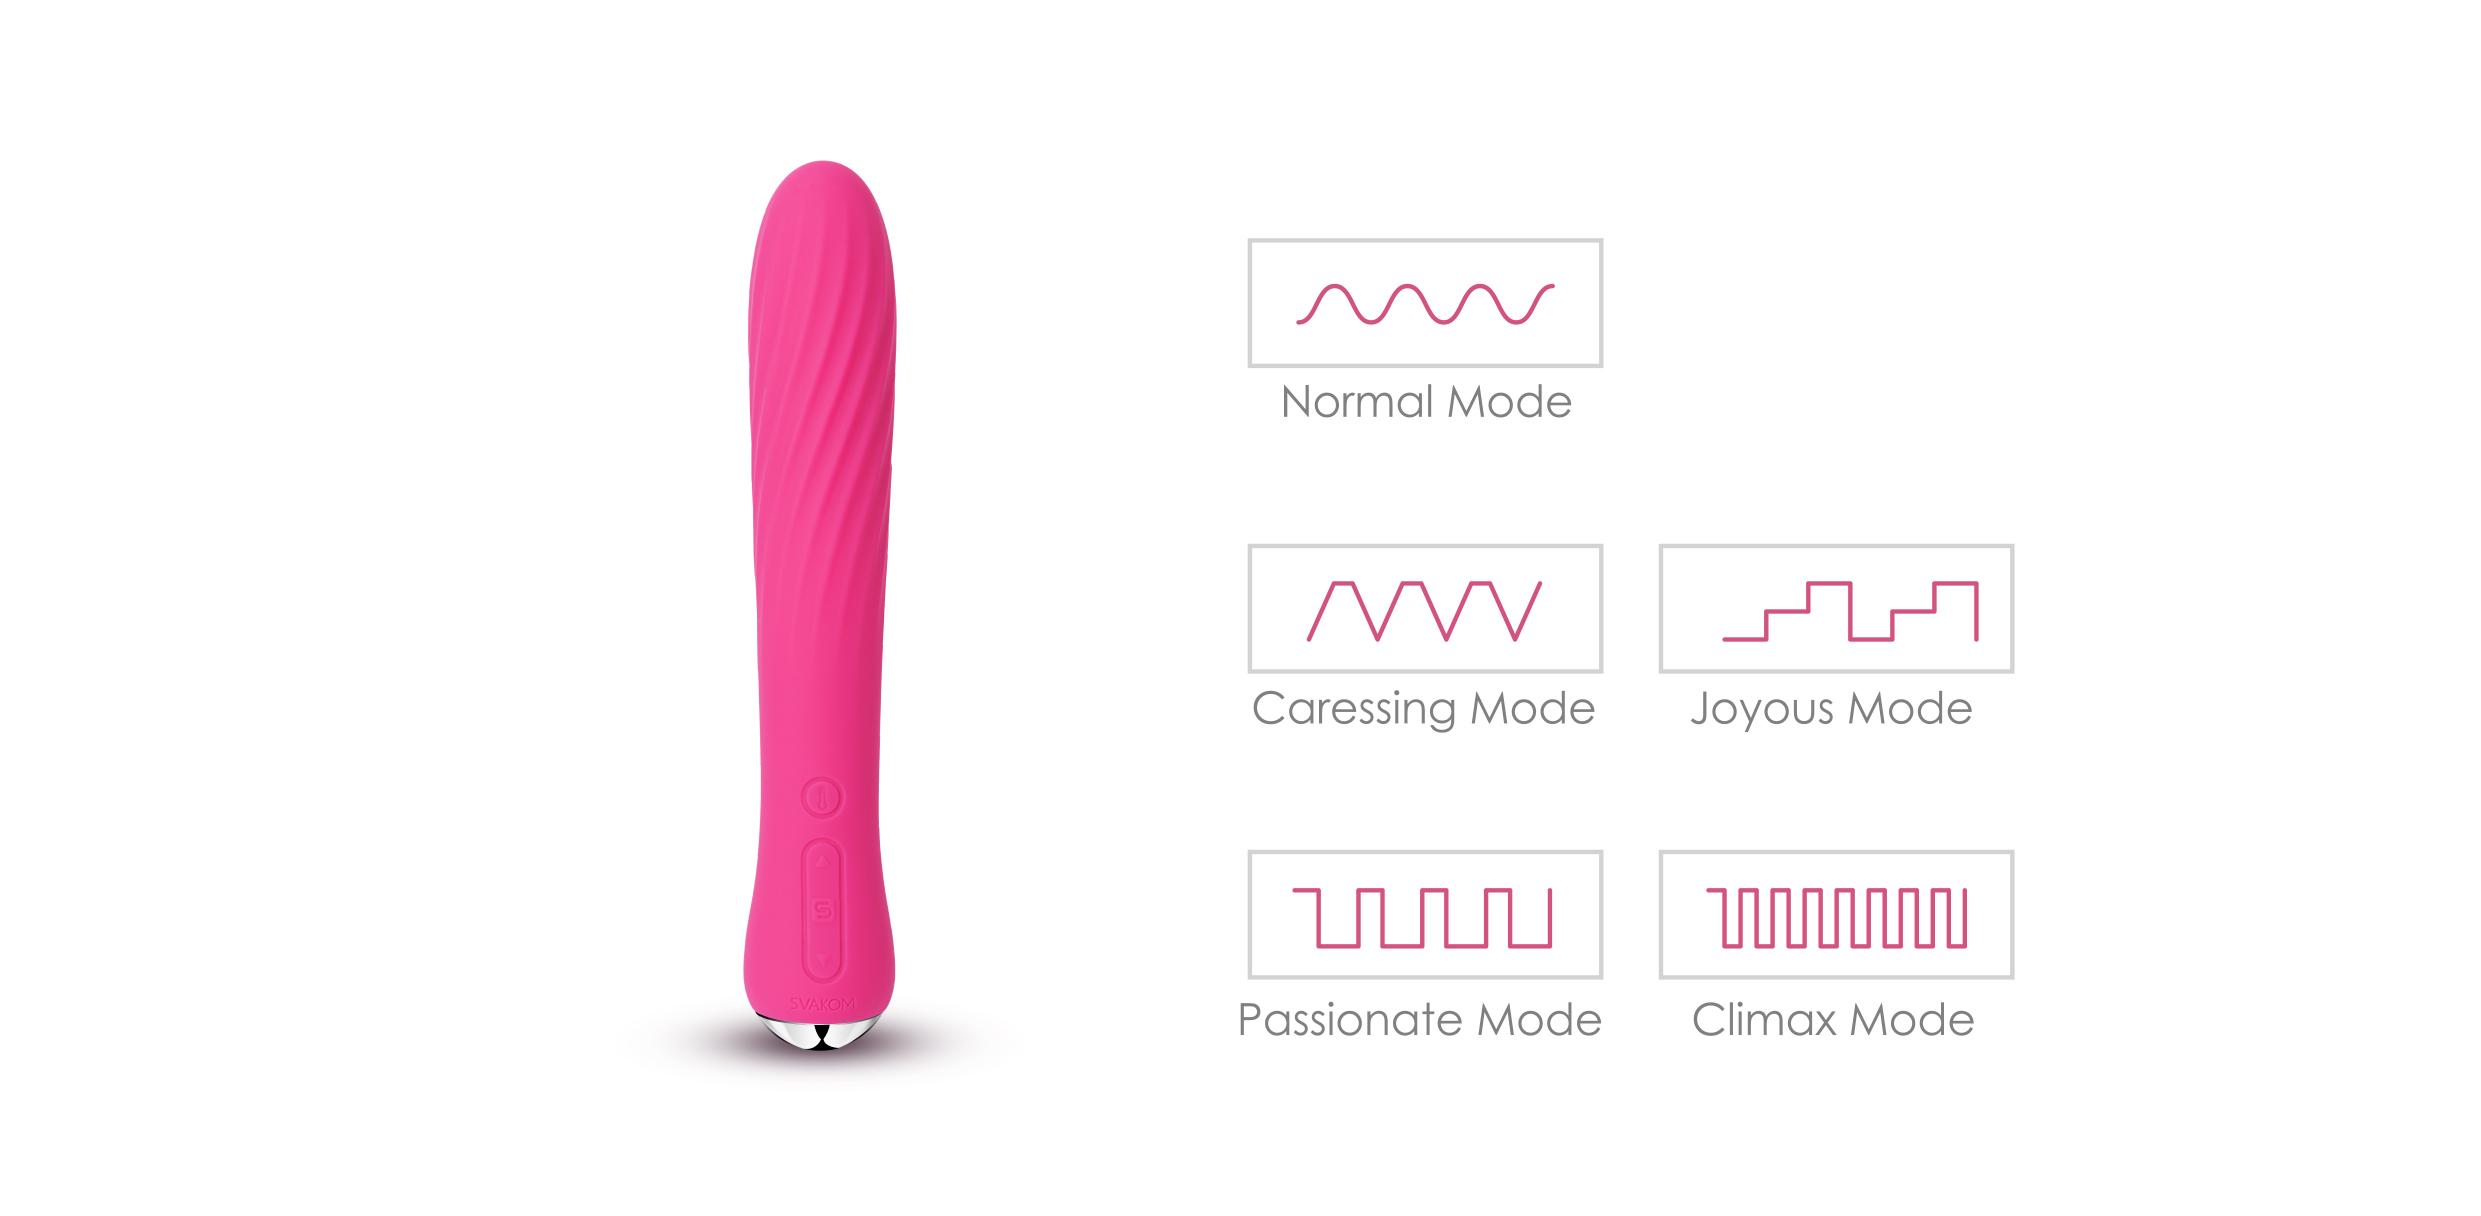 Anya - Vibrator Spiralat Multi Functional - Moduri de vibratie